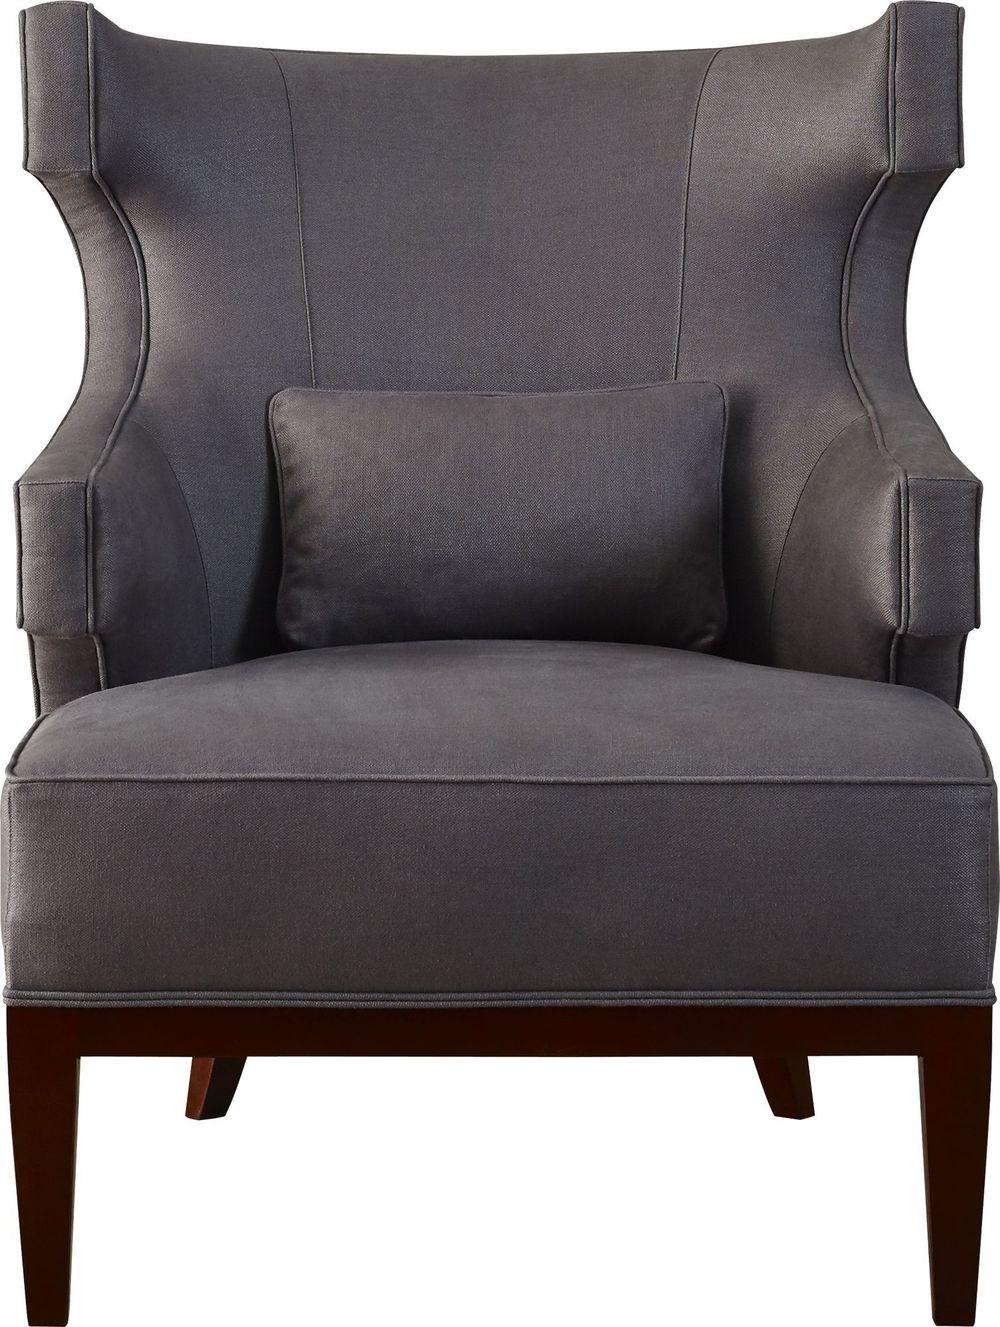 Baker Furniture - Lisbeth Lounge Chair